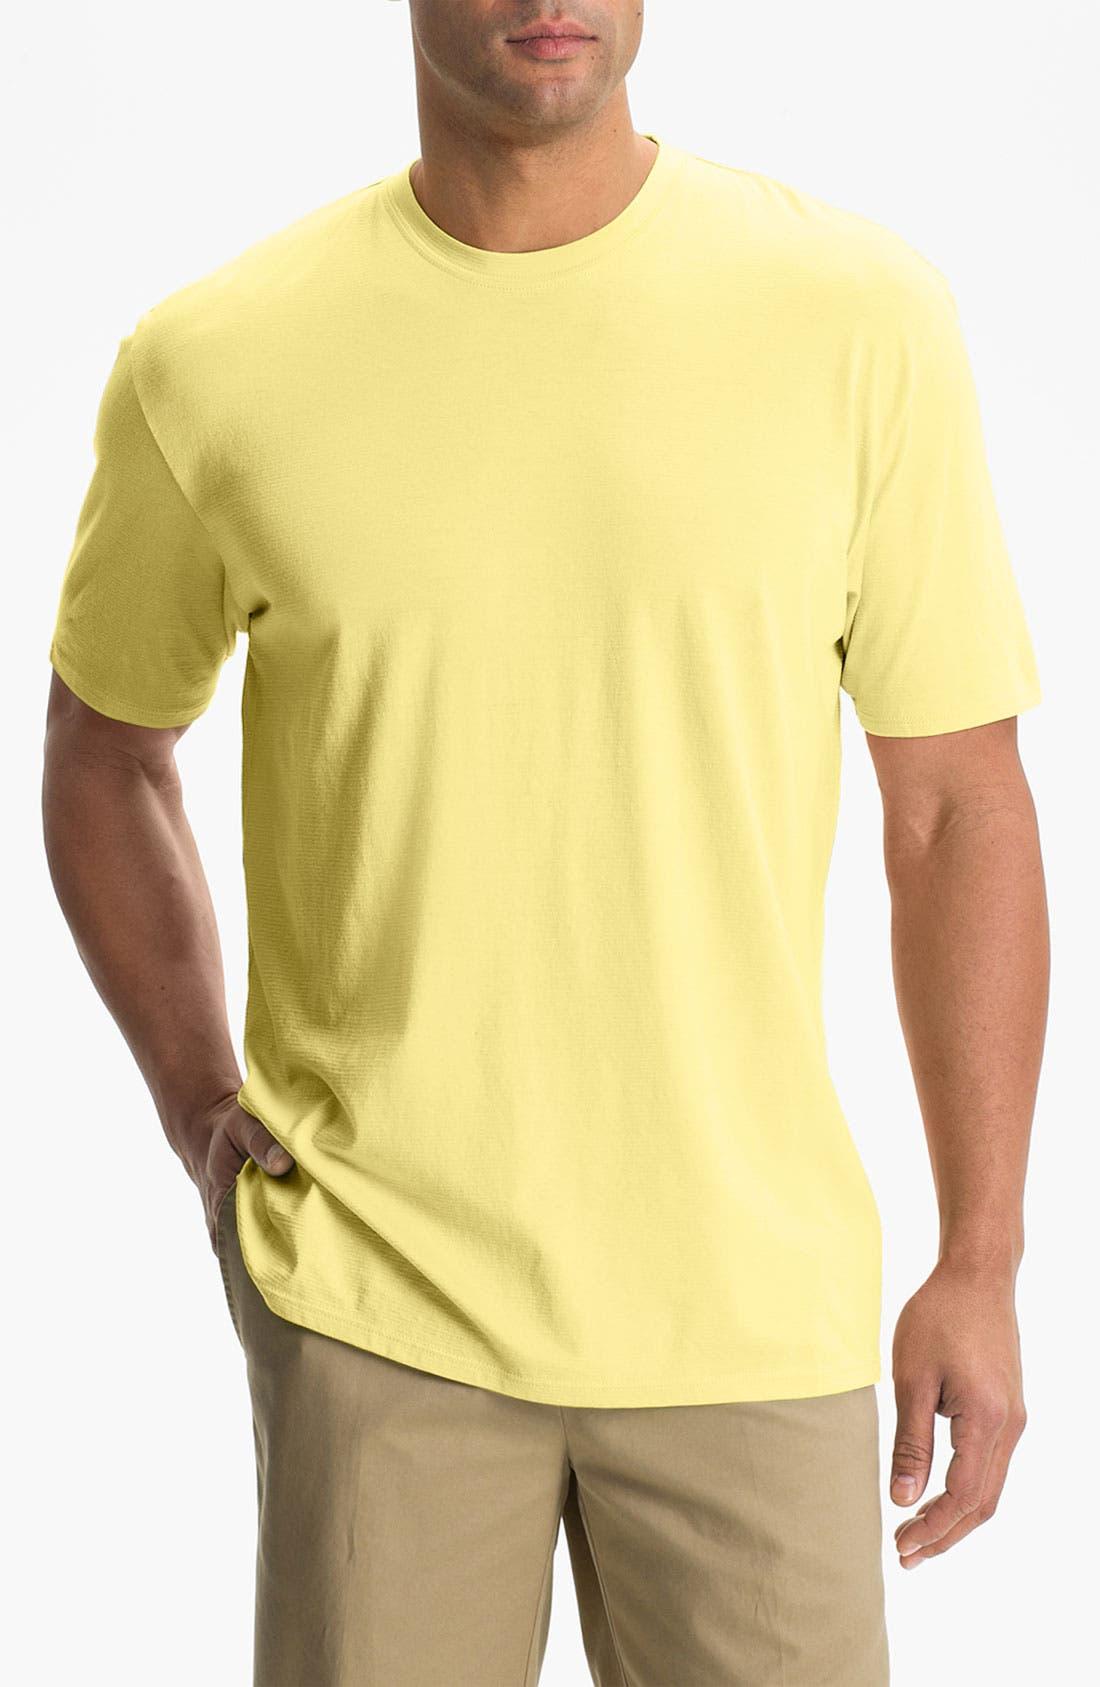 Alternate Image 1 Selected - Cutter & Buck Crewneck T-Shirt (Big & Tall)